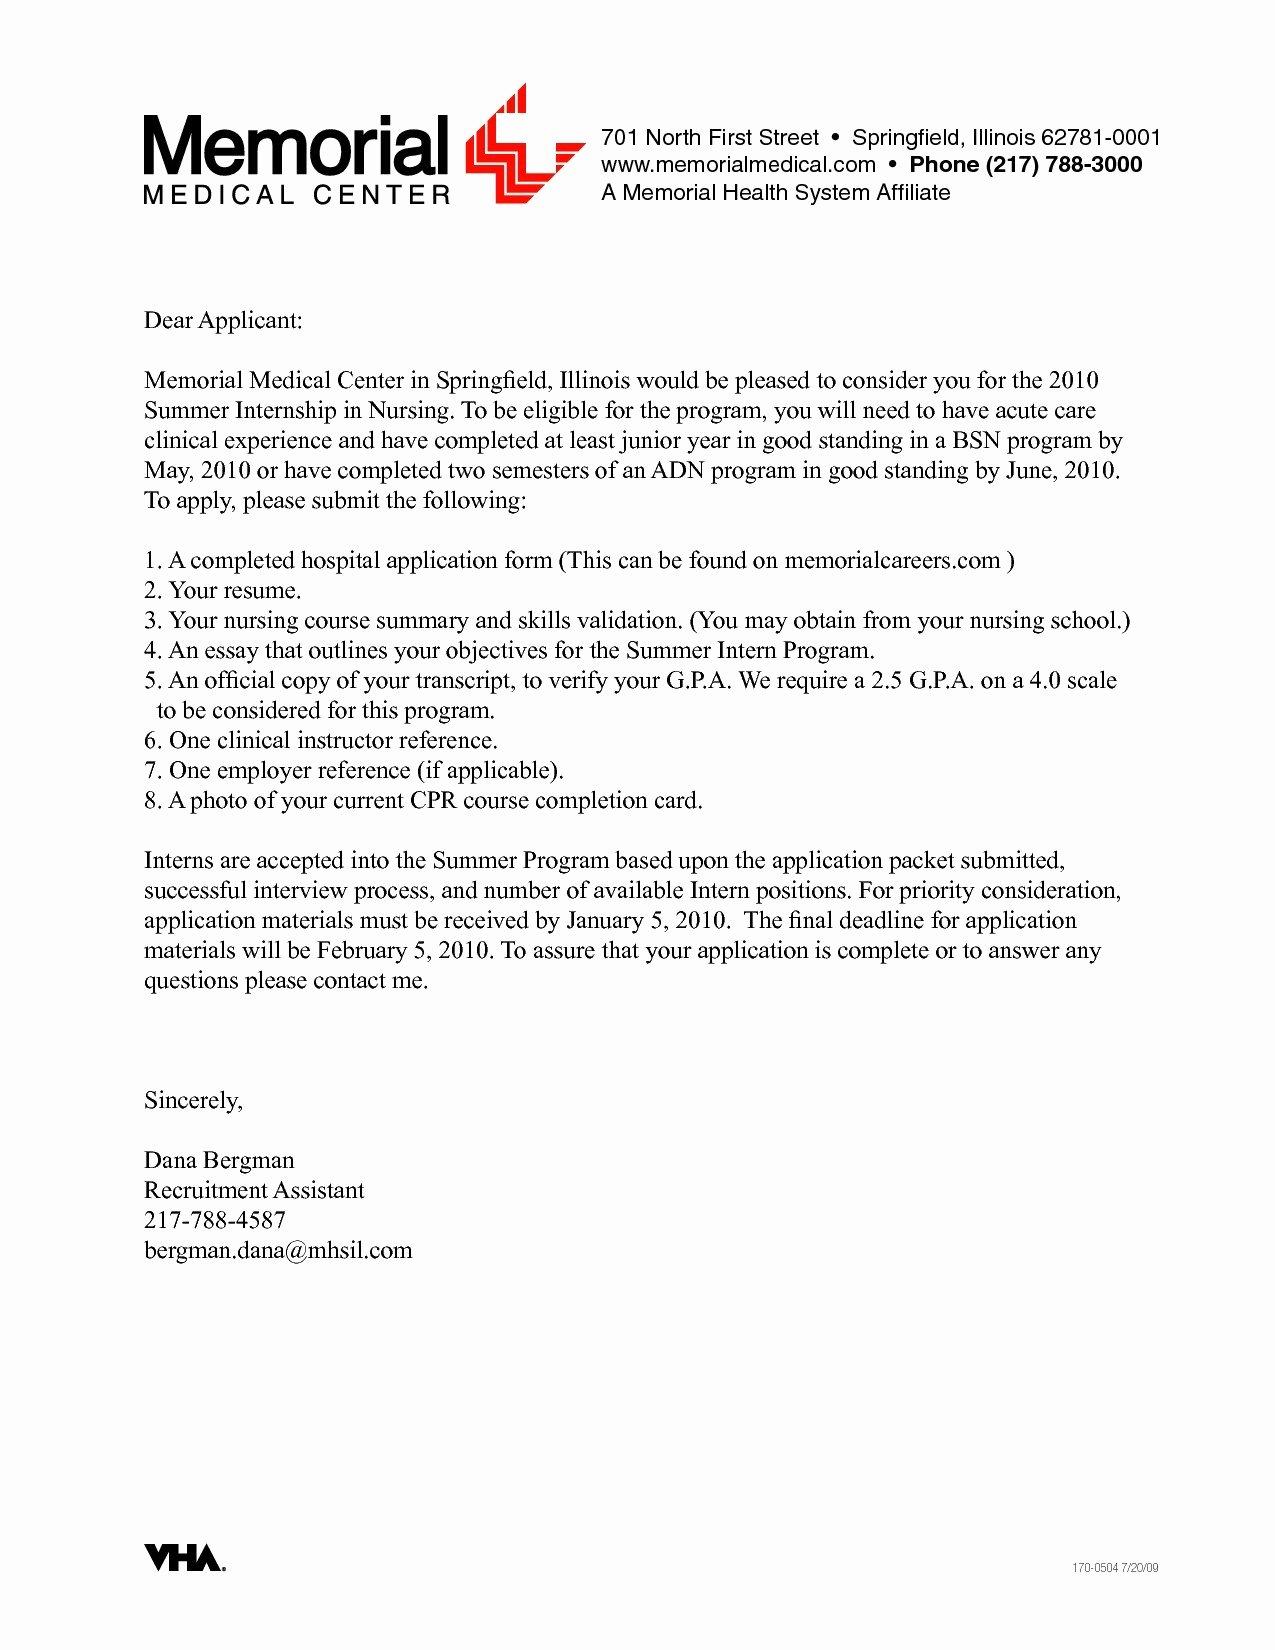 Letter Of Good Standing Sample New Sample A Certificate Good Standing Fresh Fresh